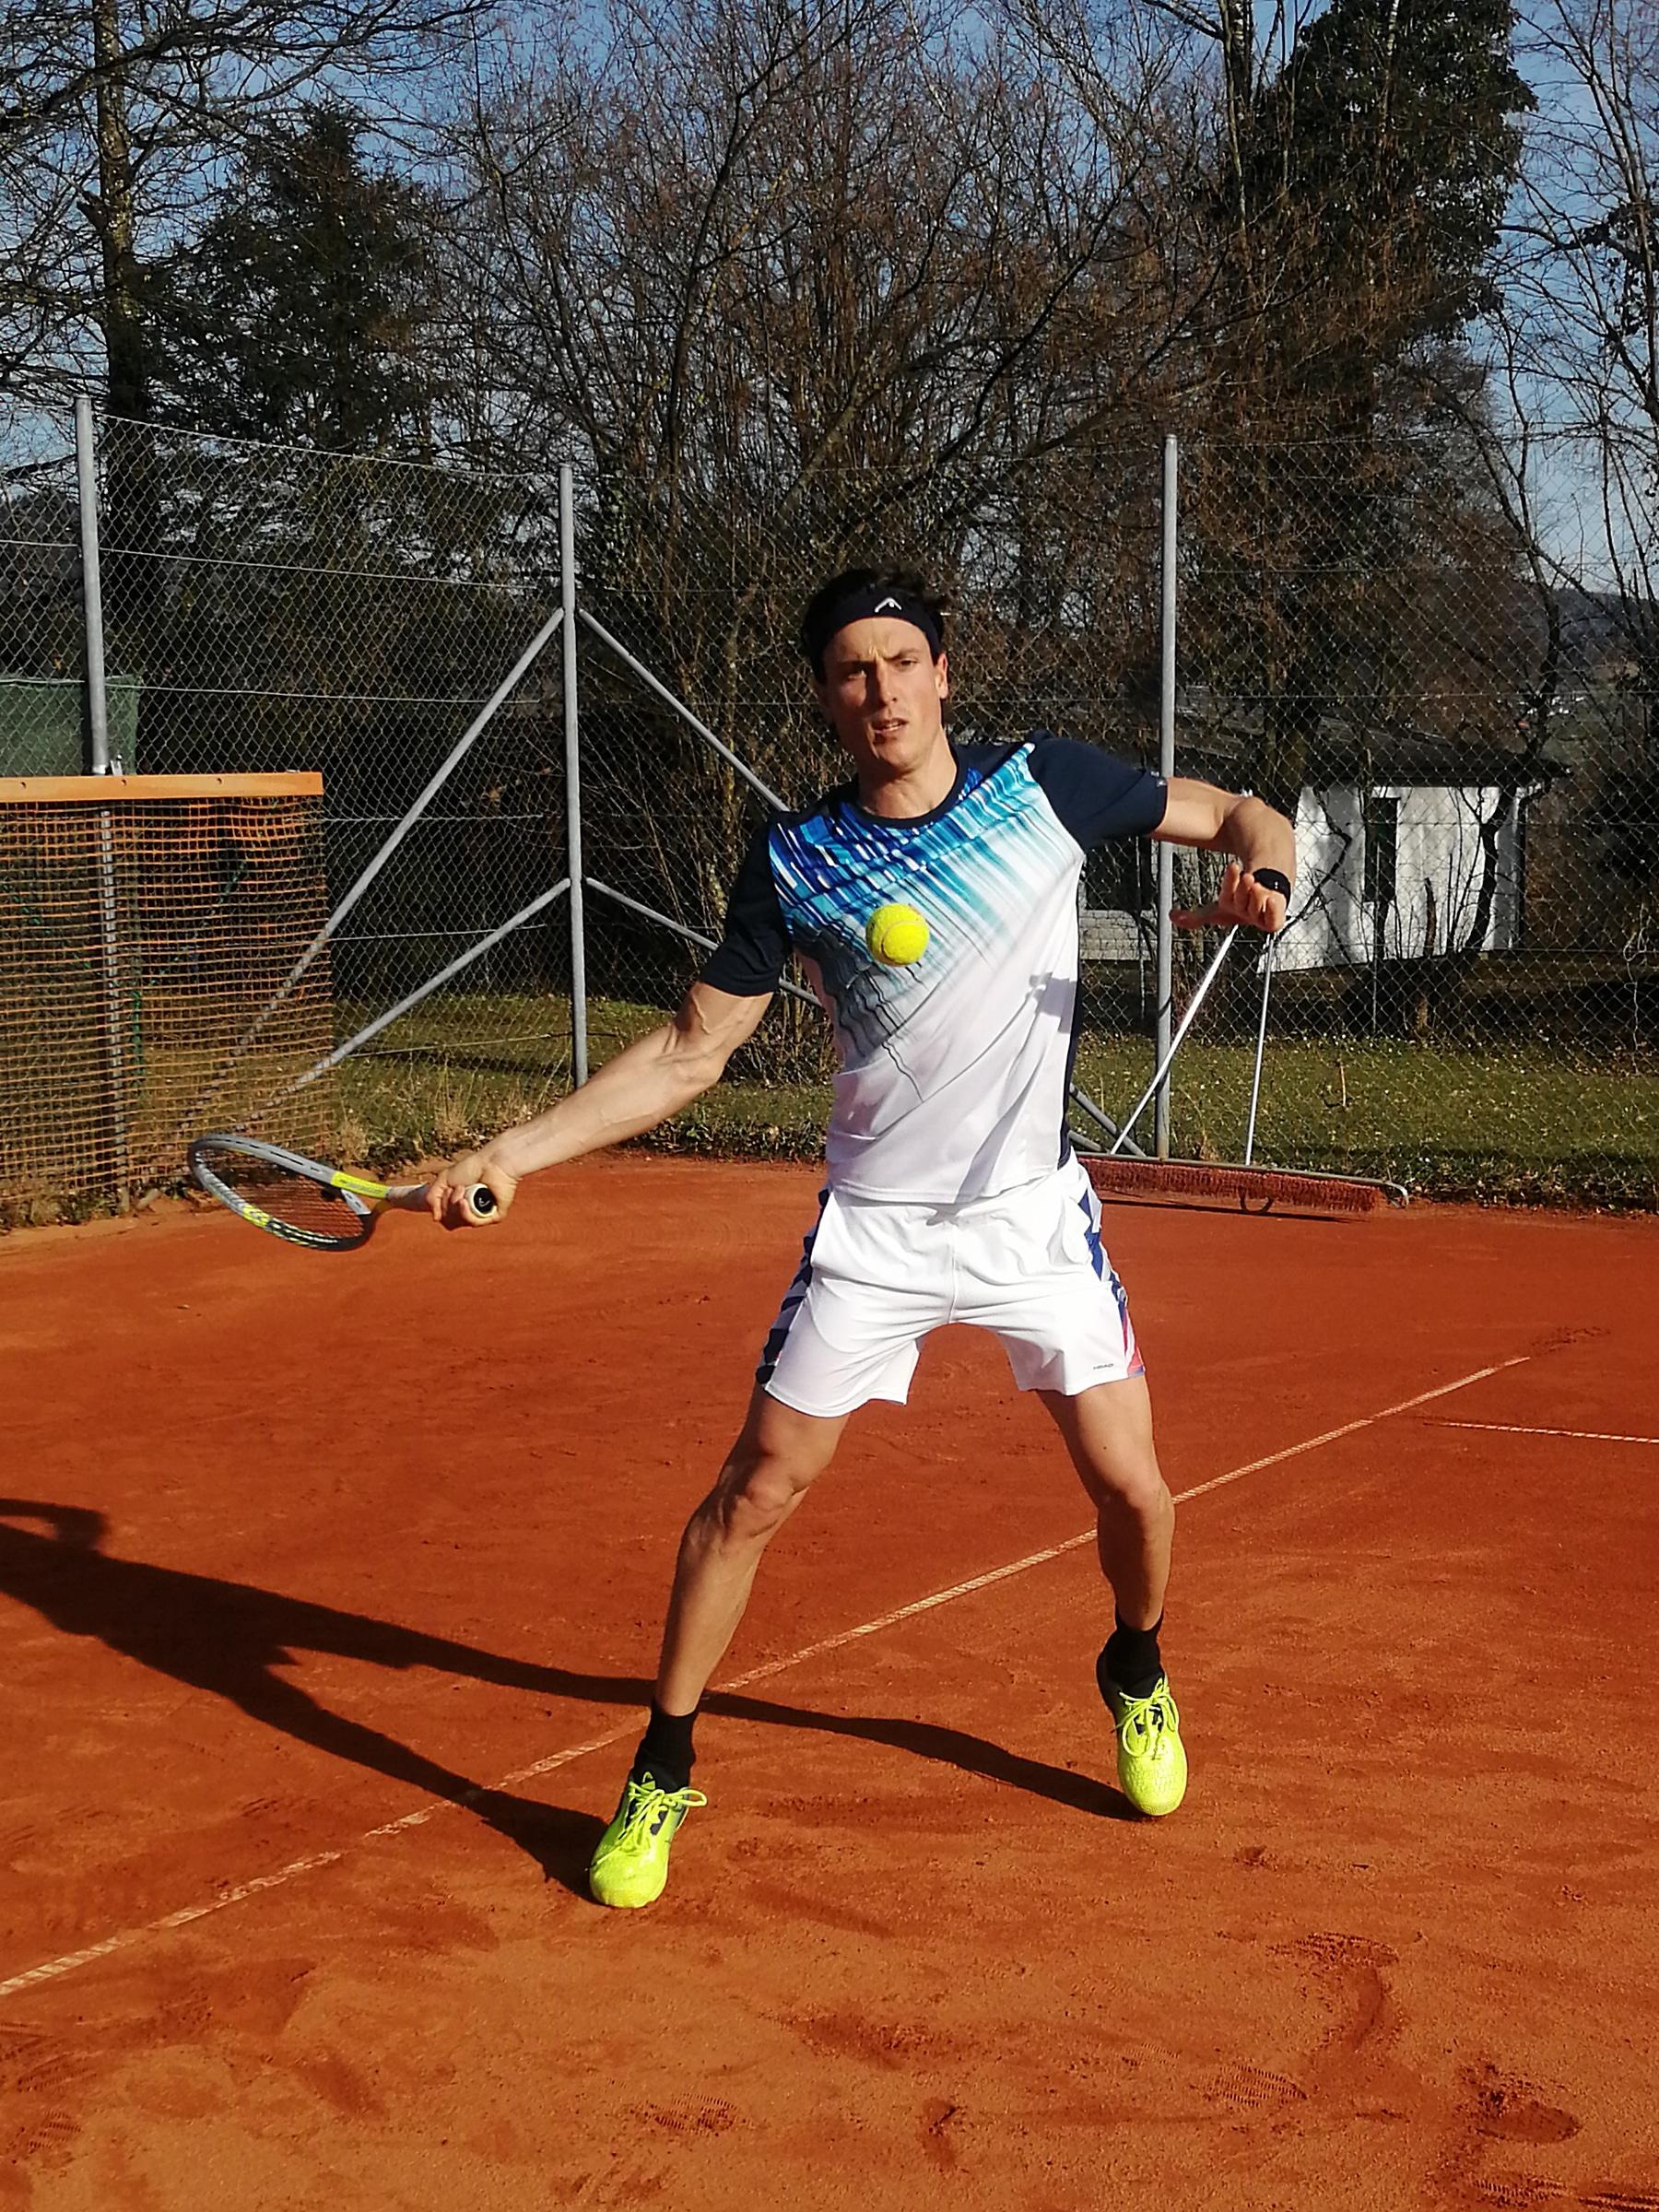 Tennis Bekleidung City Outlet Blog Dominik Wirlend Tennis Outfit